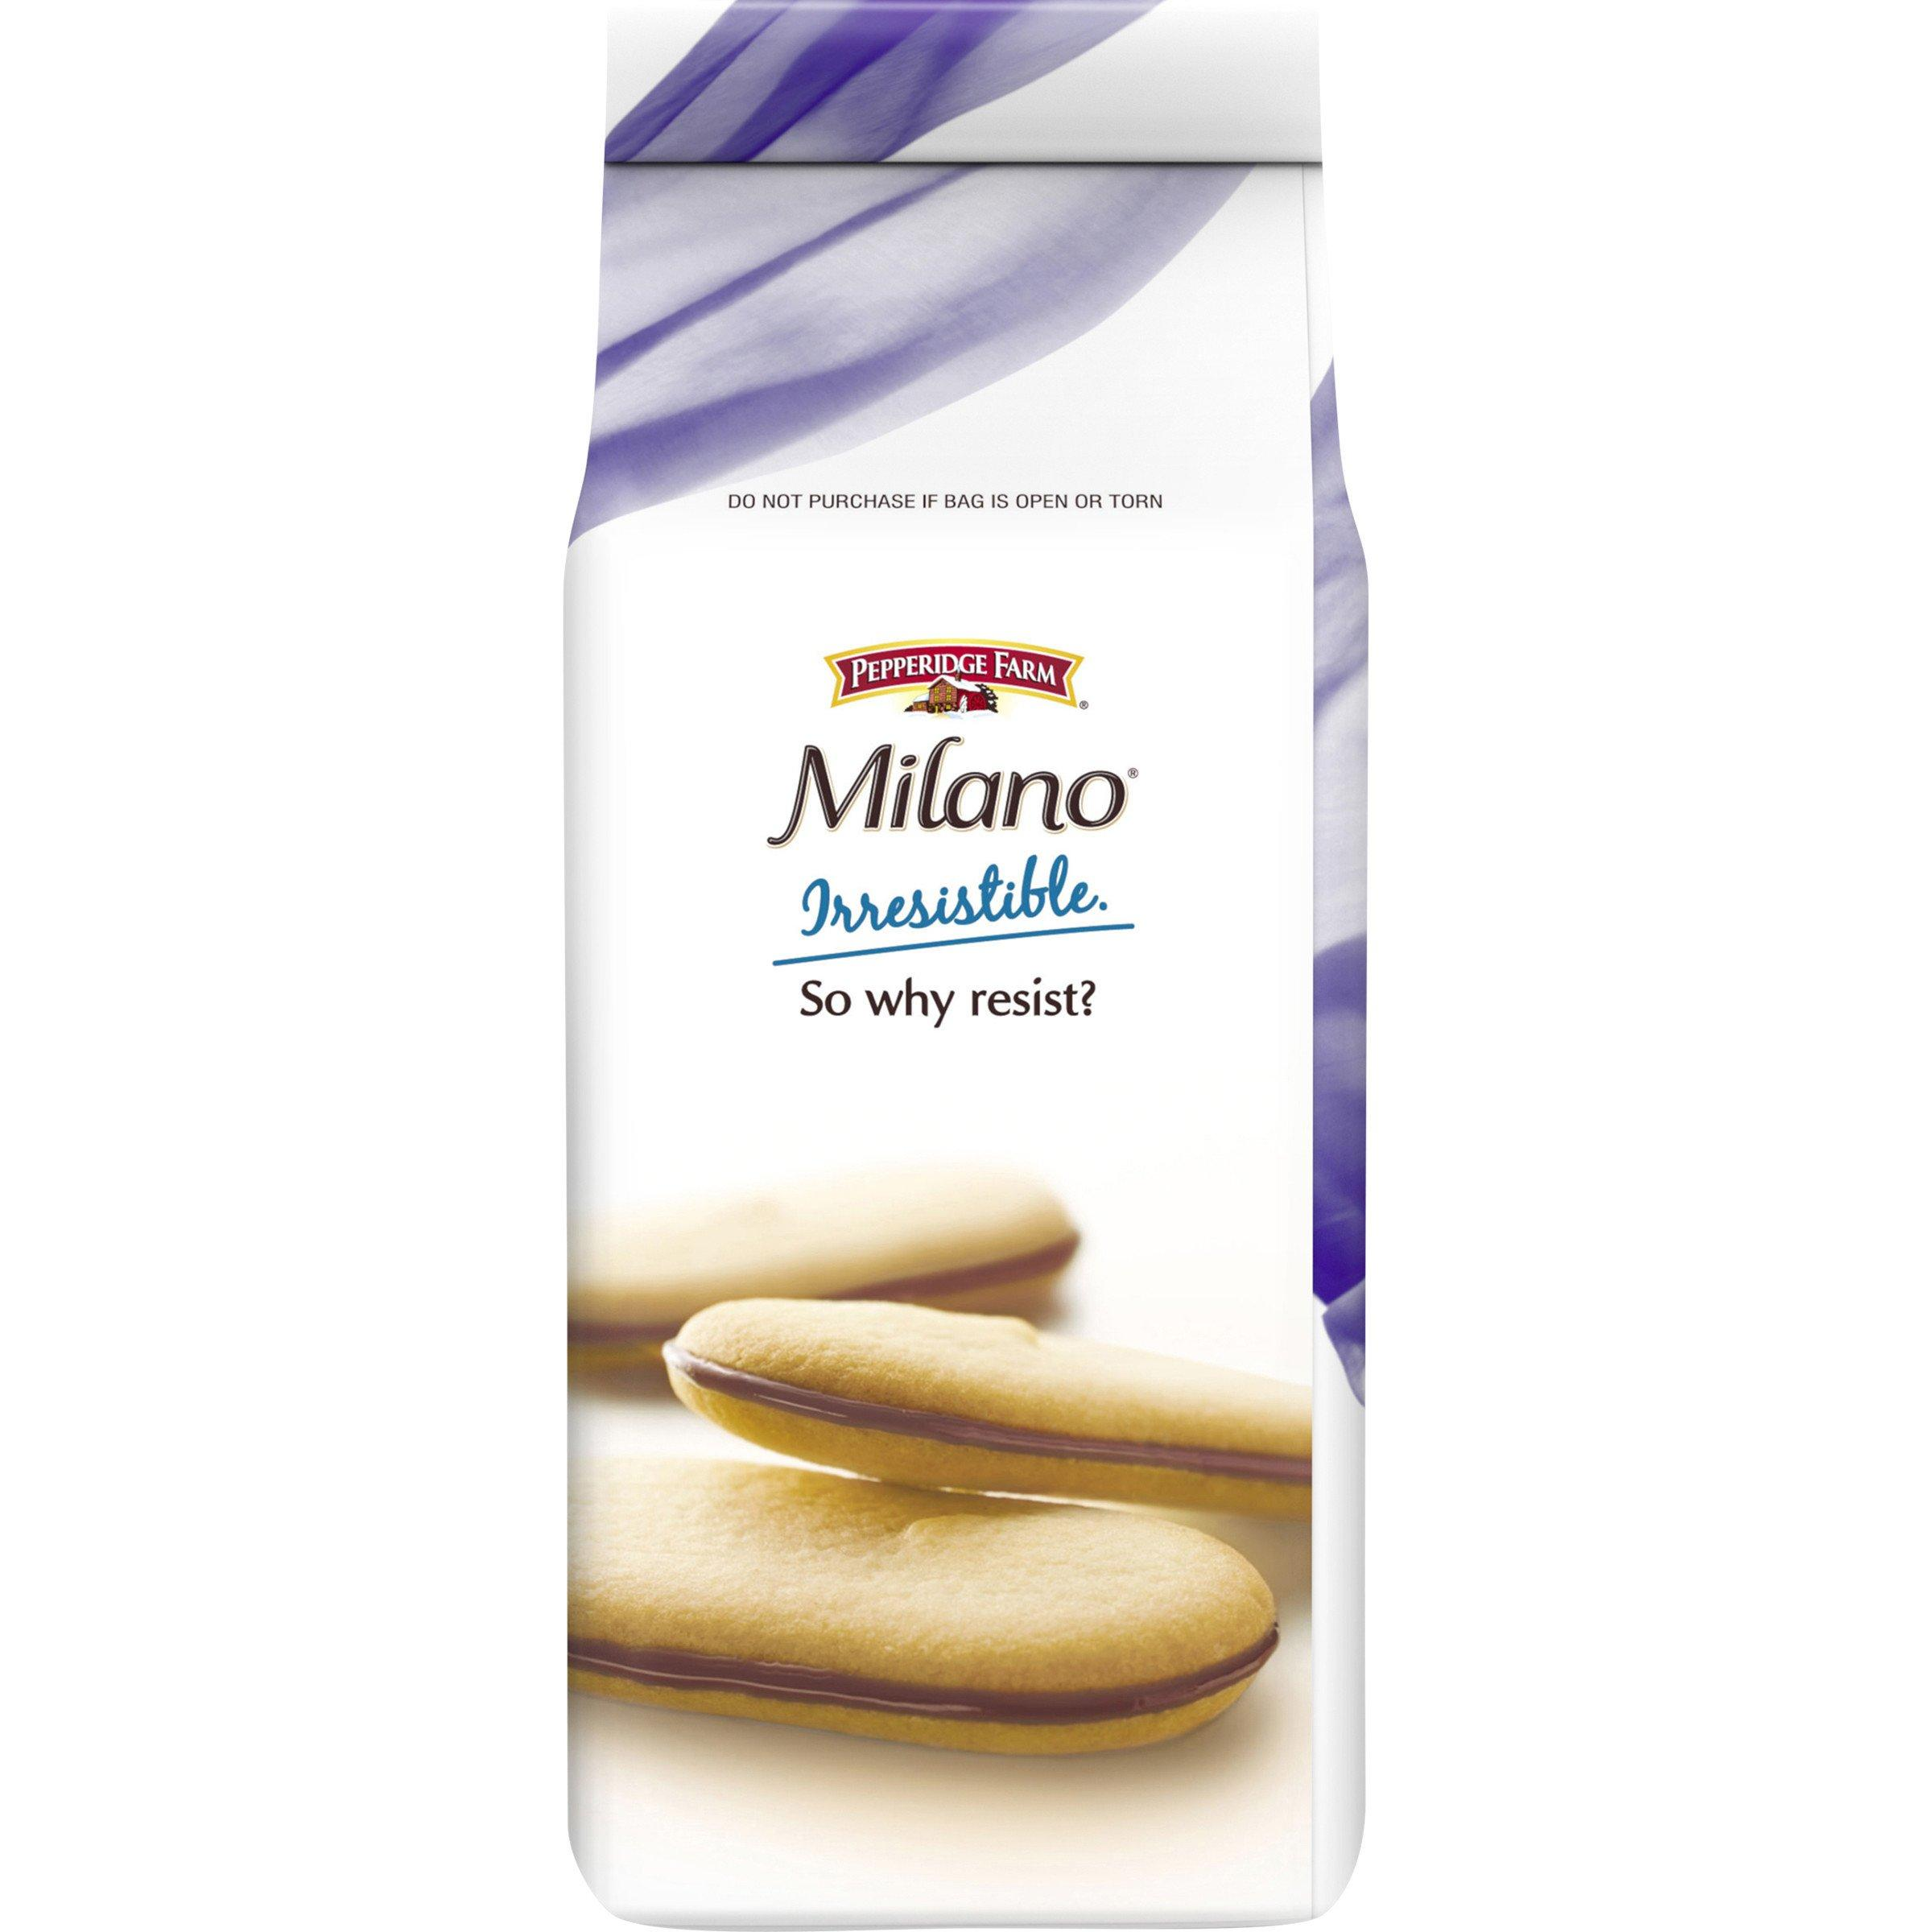 Pepperidge-Farm-Milano-Cookies-Double-Milk-Chocolate-7-5-oz-Bag-3-count thumbnail 6